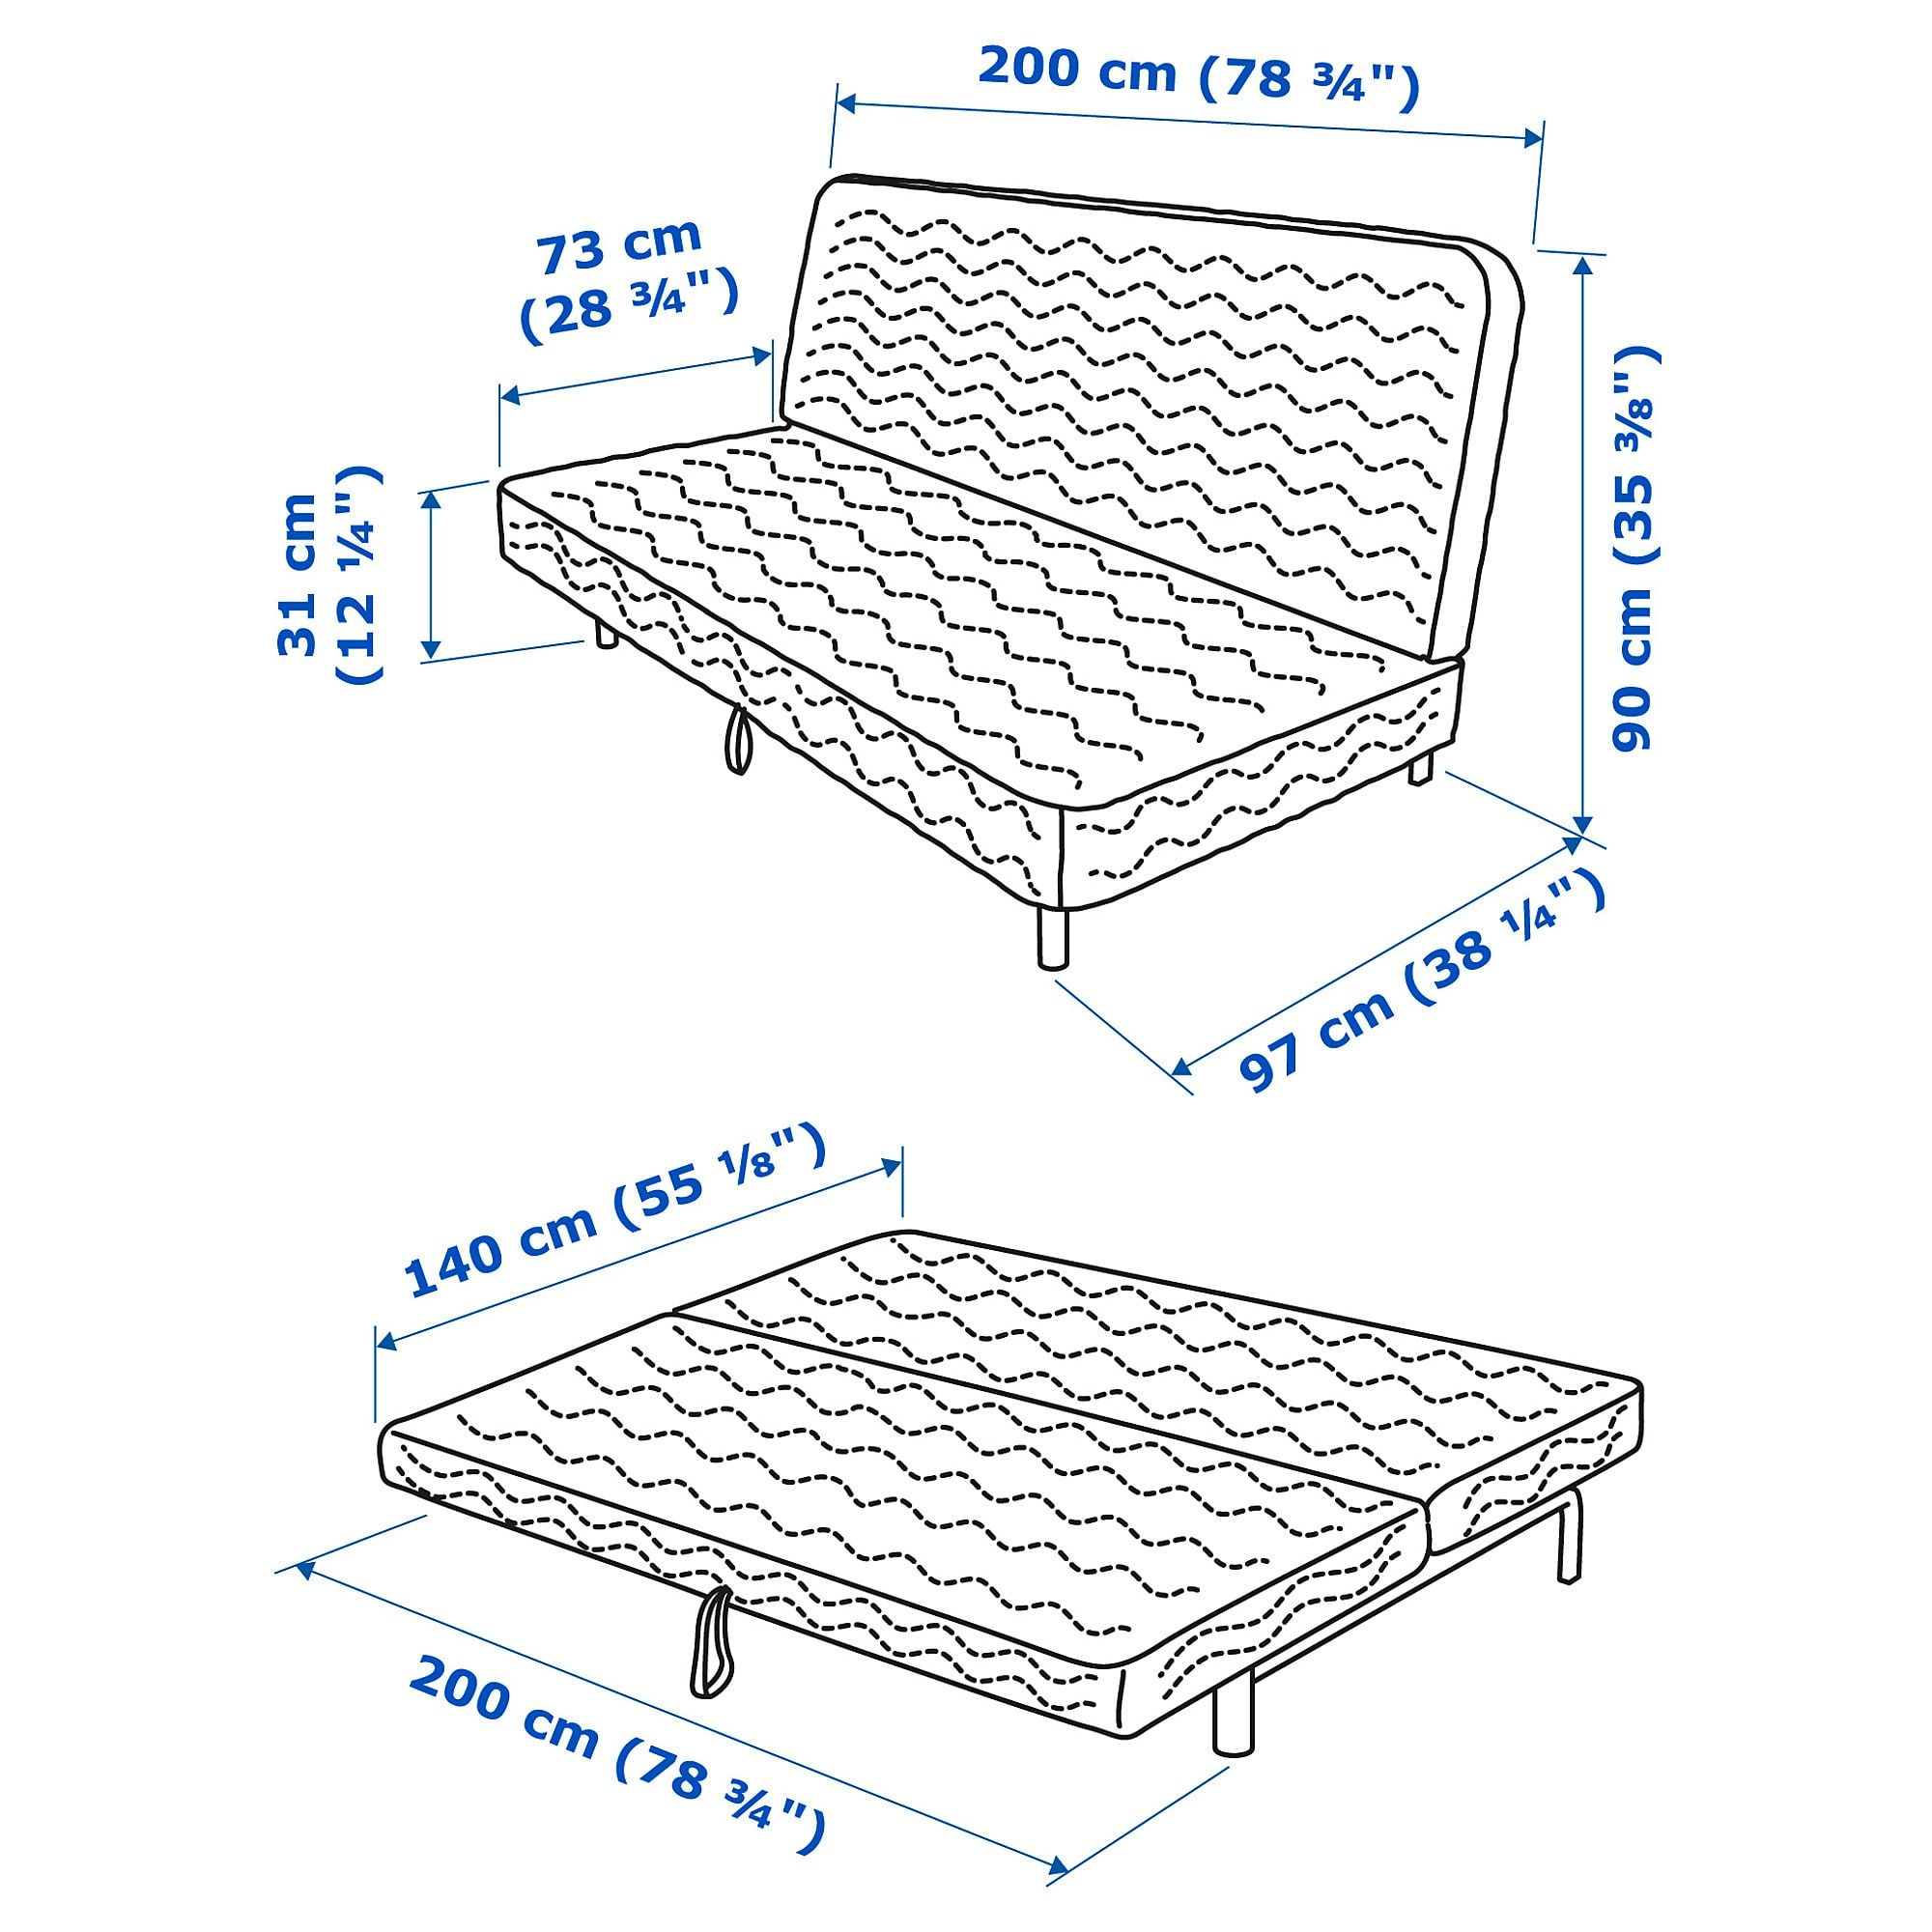 Pong Fauteuil Ikea.Ikea Nyhamn Futon With Foam Mattress Knisa Gray Beige